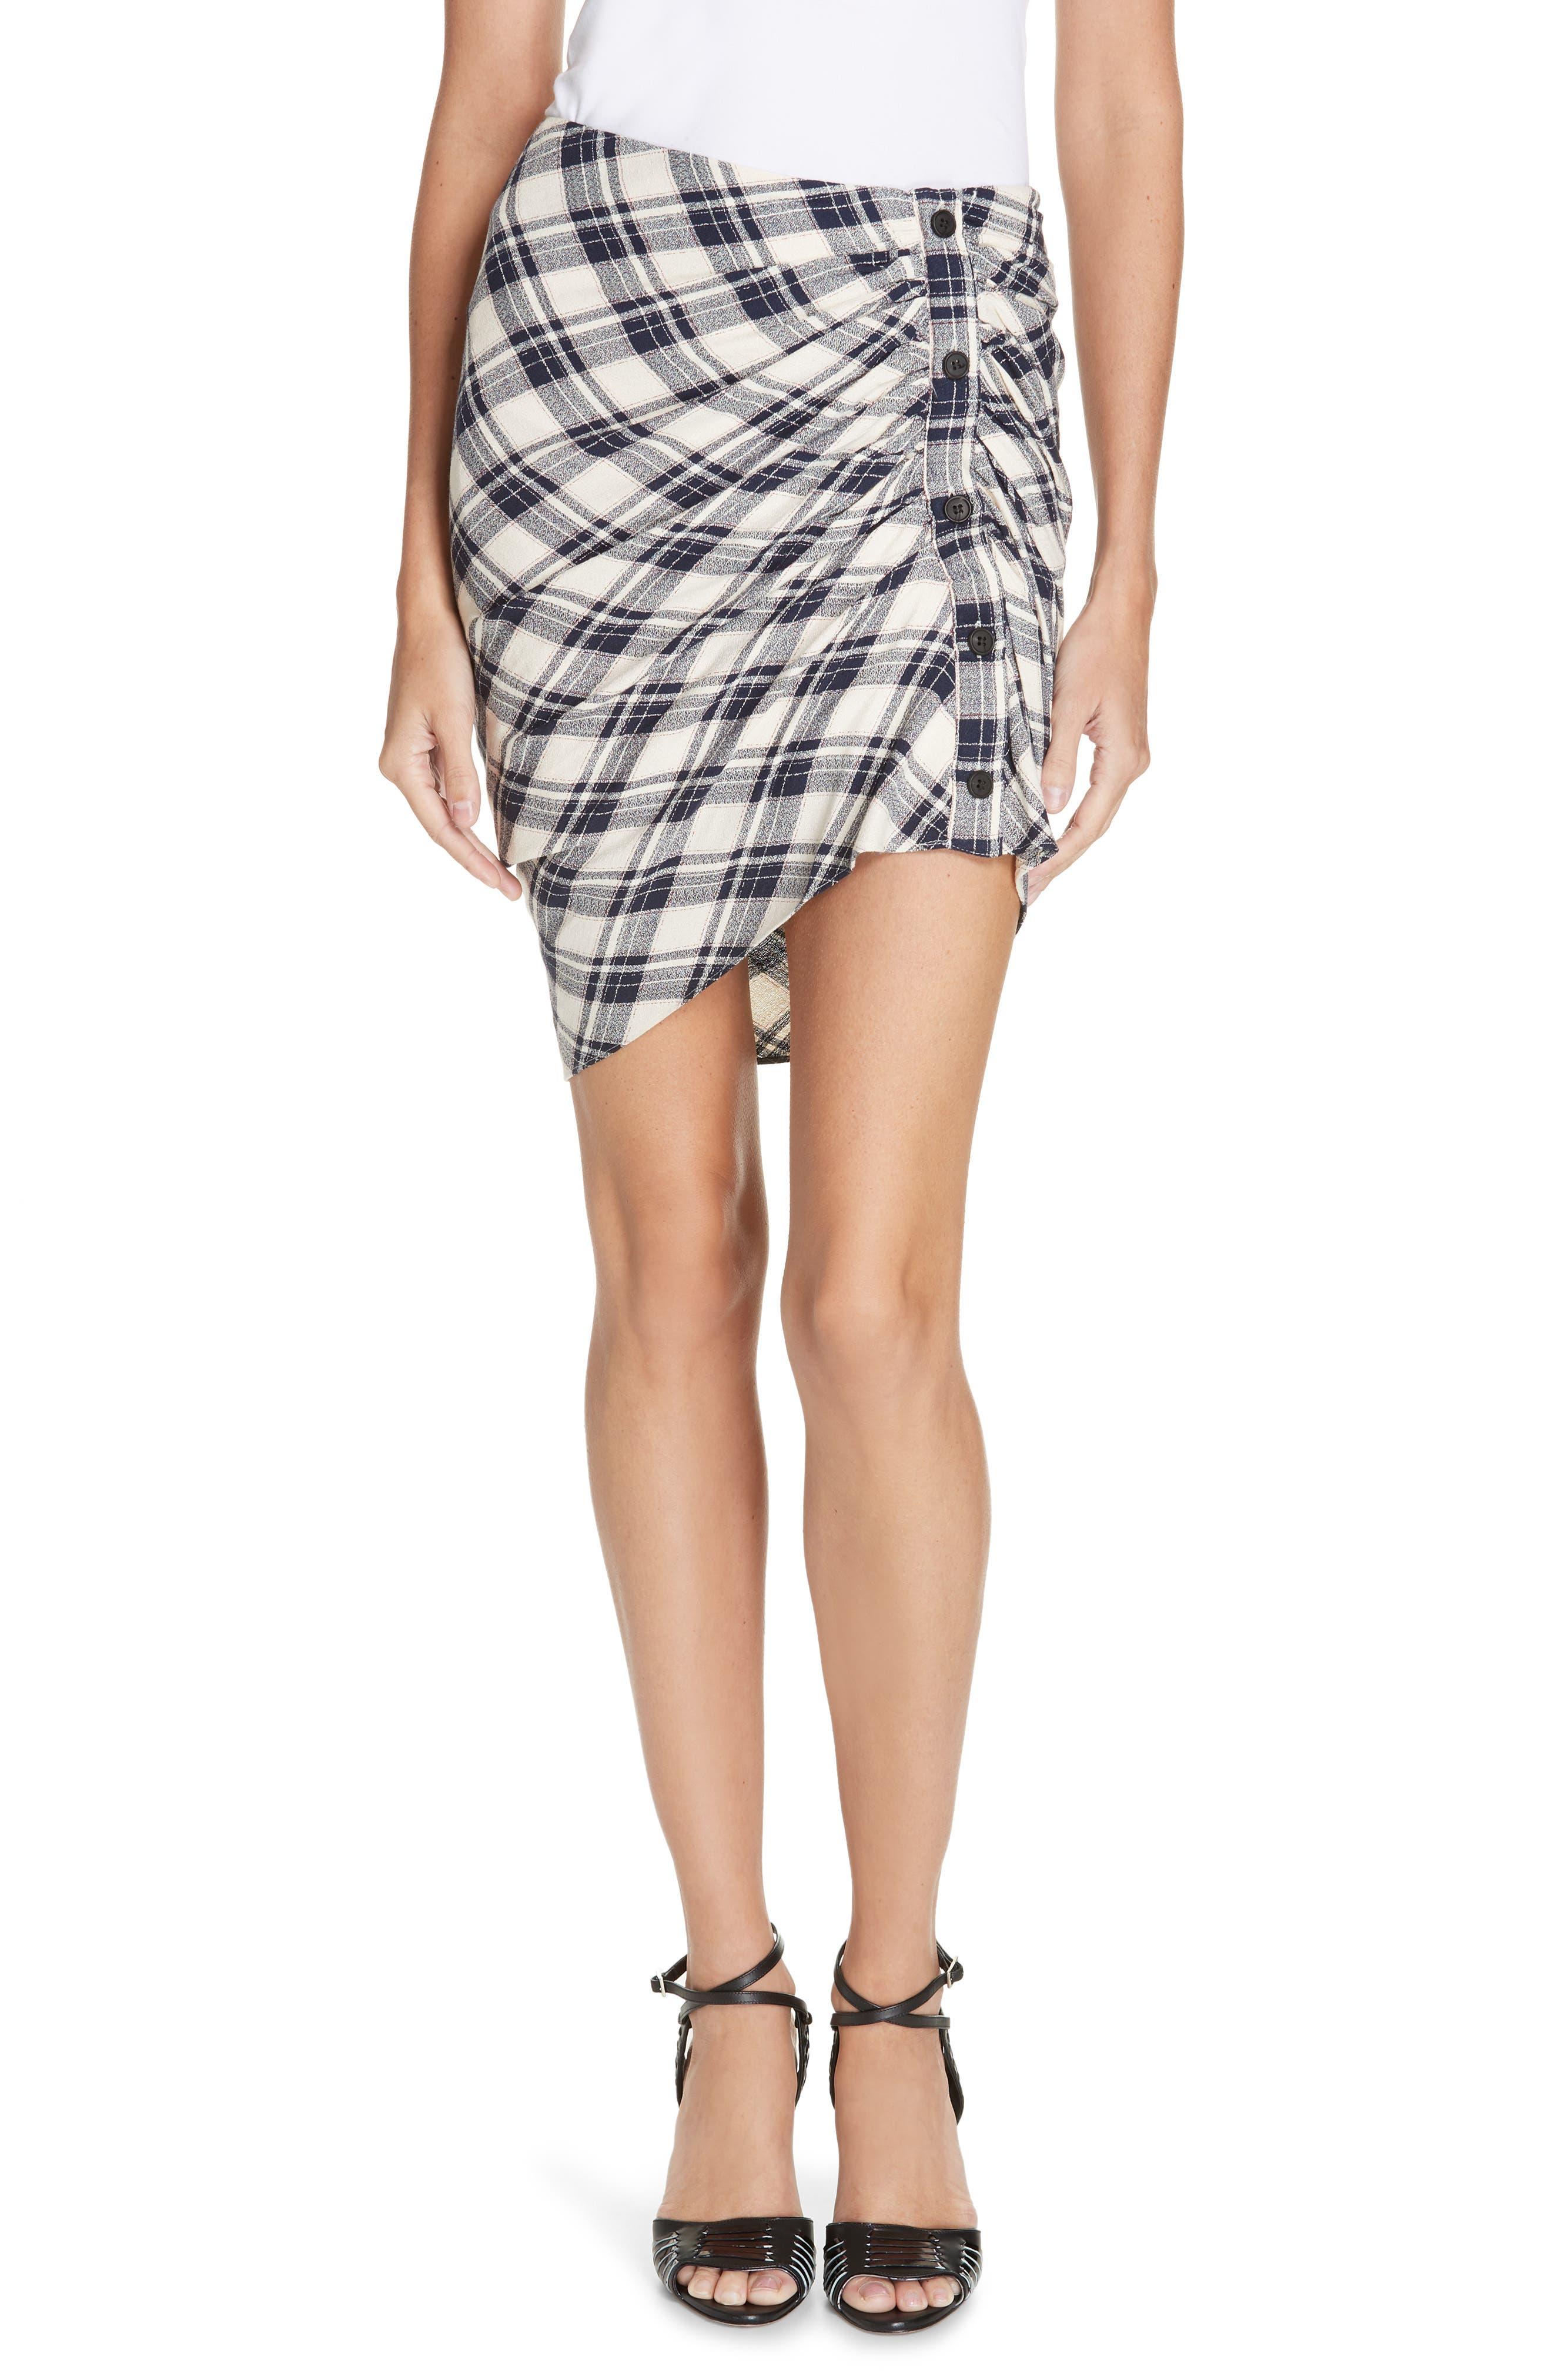 Murphy Ruched Miniskirt,                             Main thumbnail 1, color,                             NAVY/ ECRU